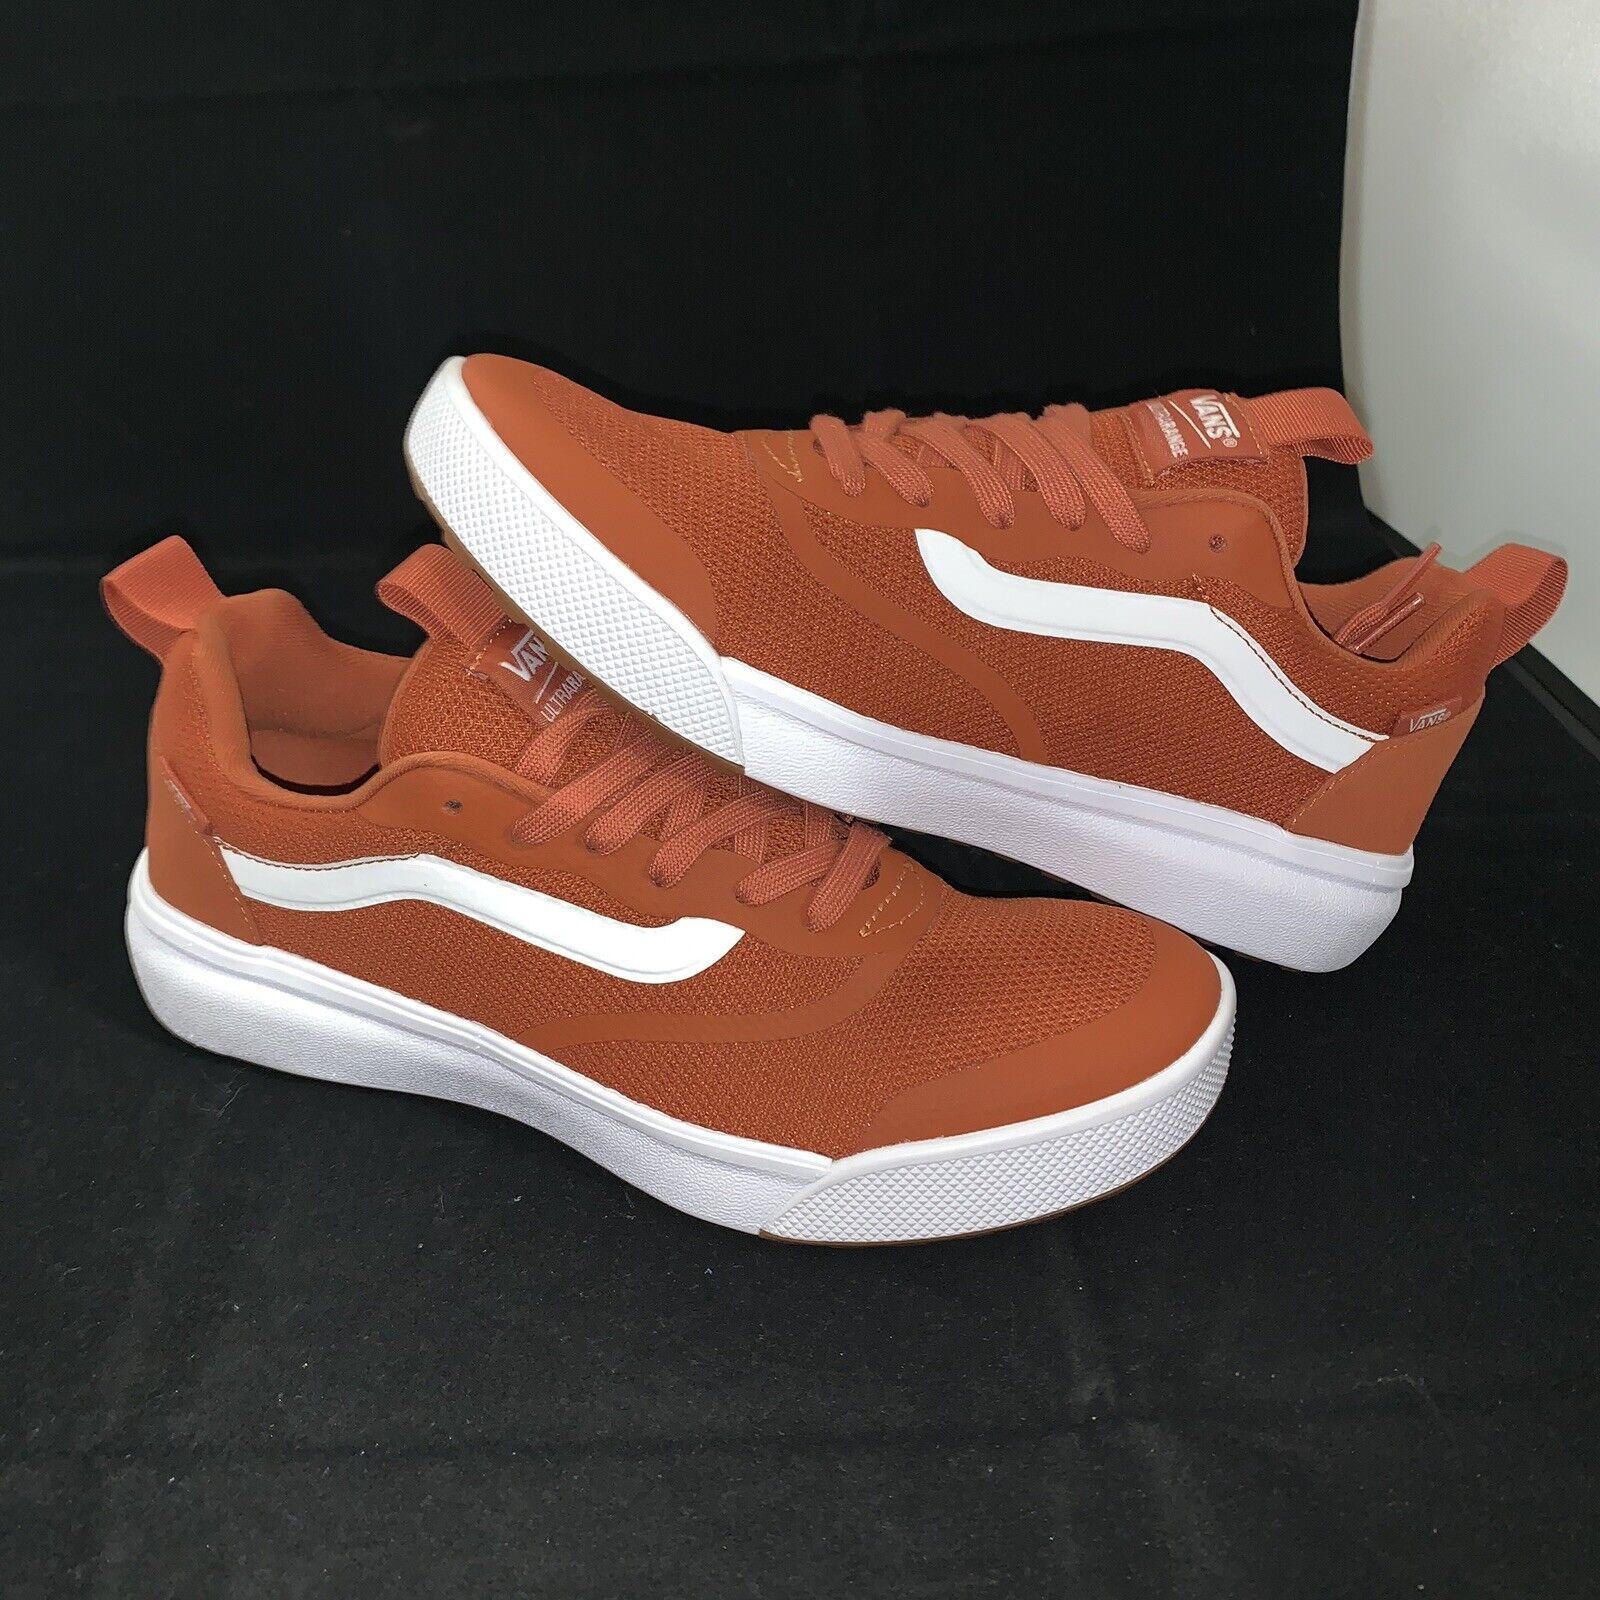 Vans muestra auténtico ultrarange Rapidweld Zapatos Potters arcilla